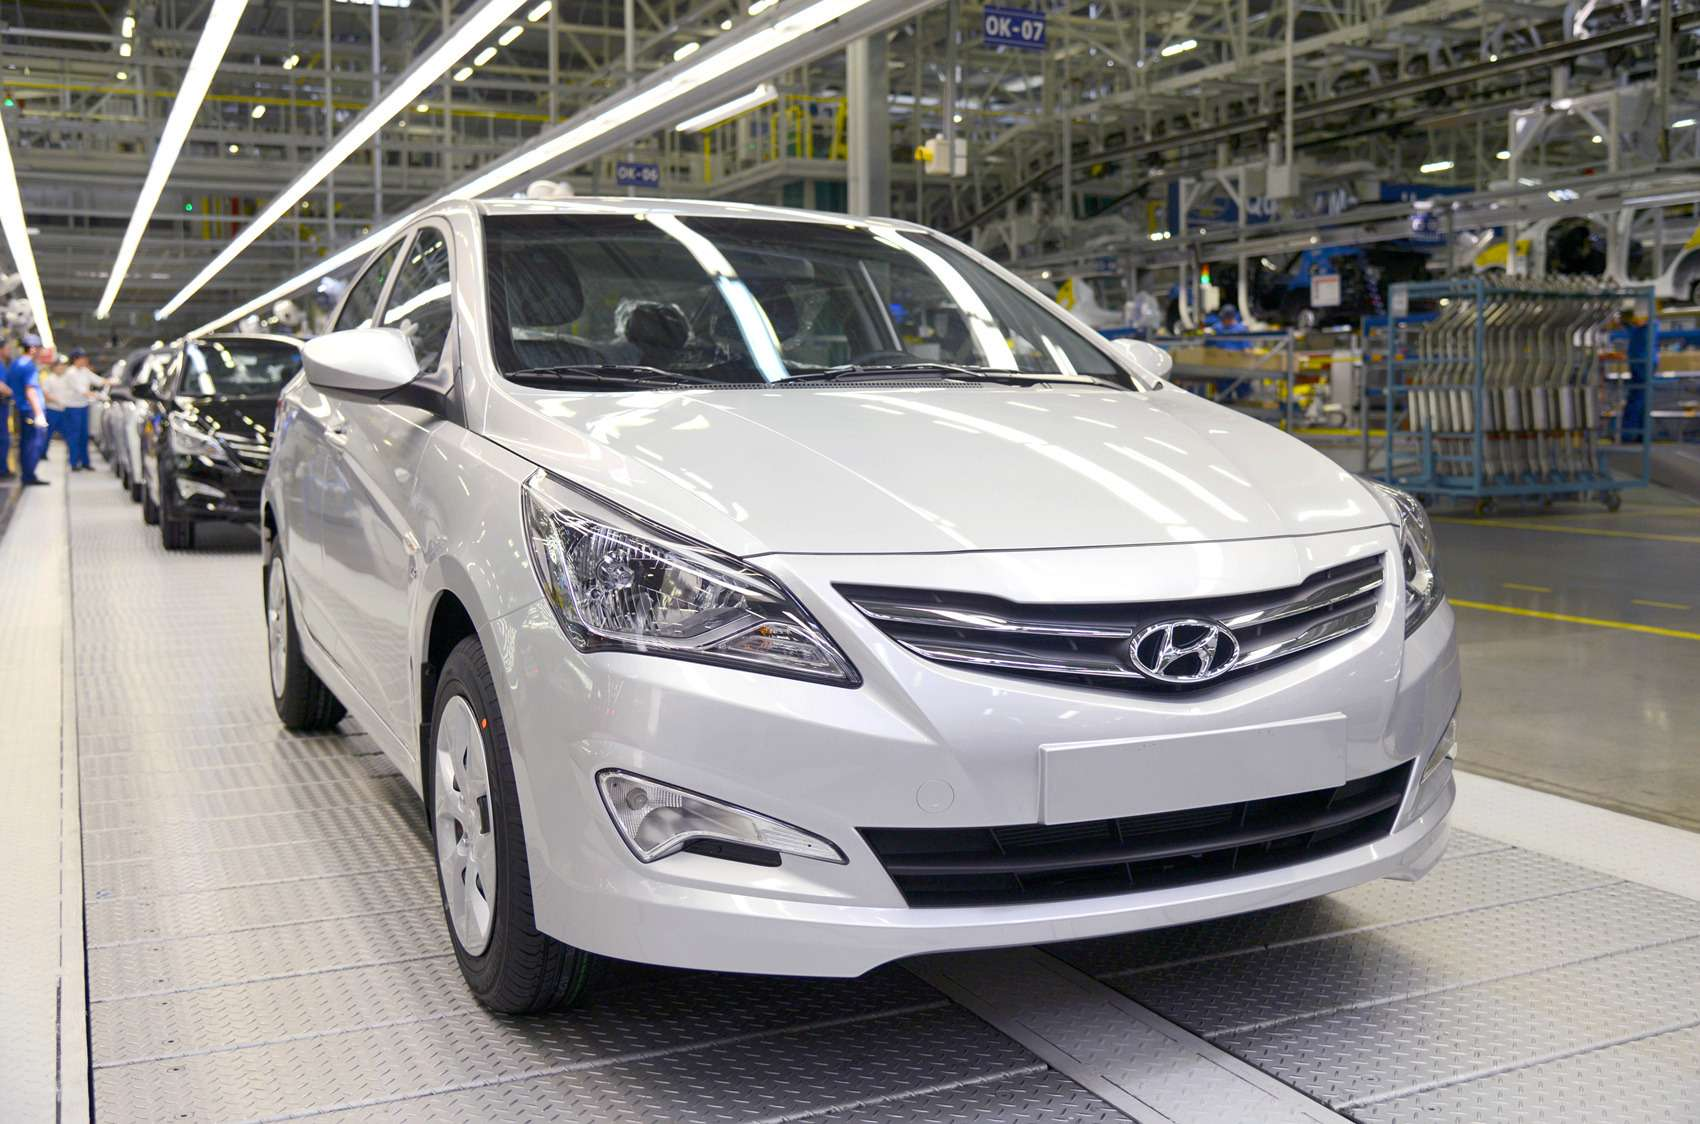 151009_HMMR manufactures 1millionth vehicle (2)